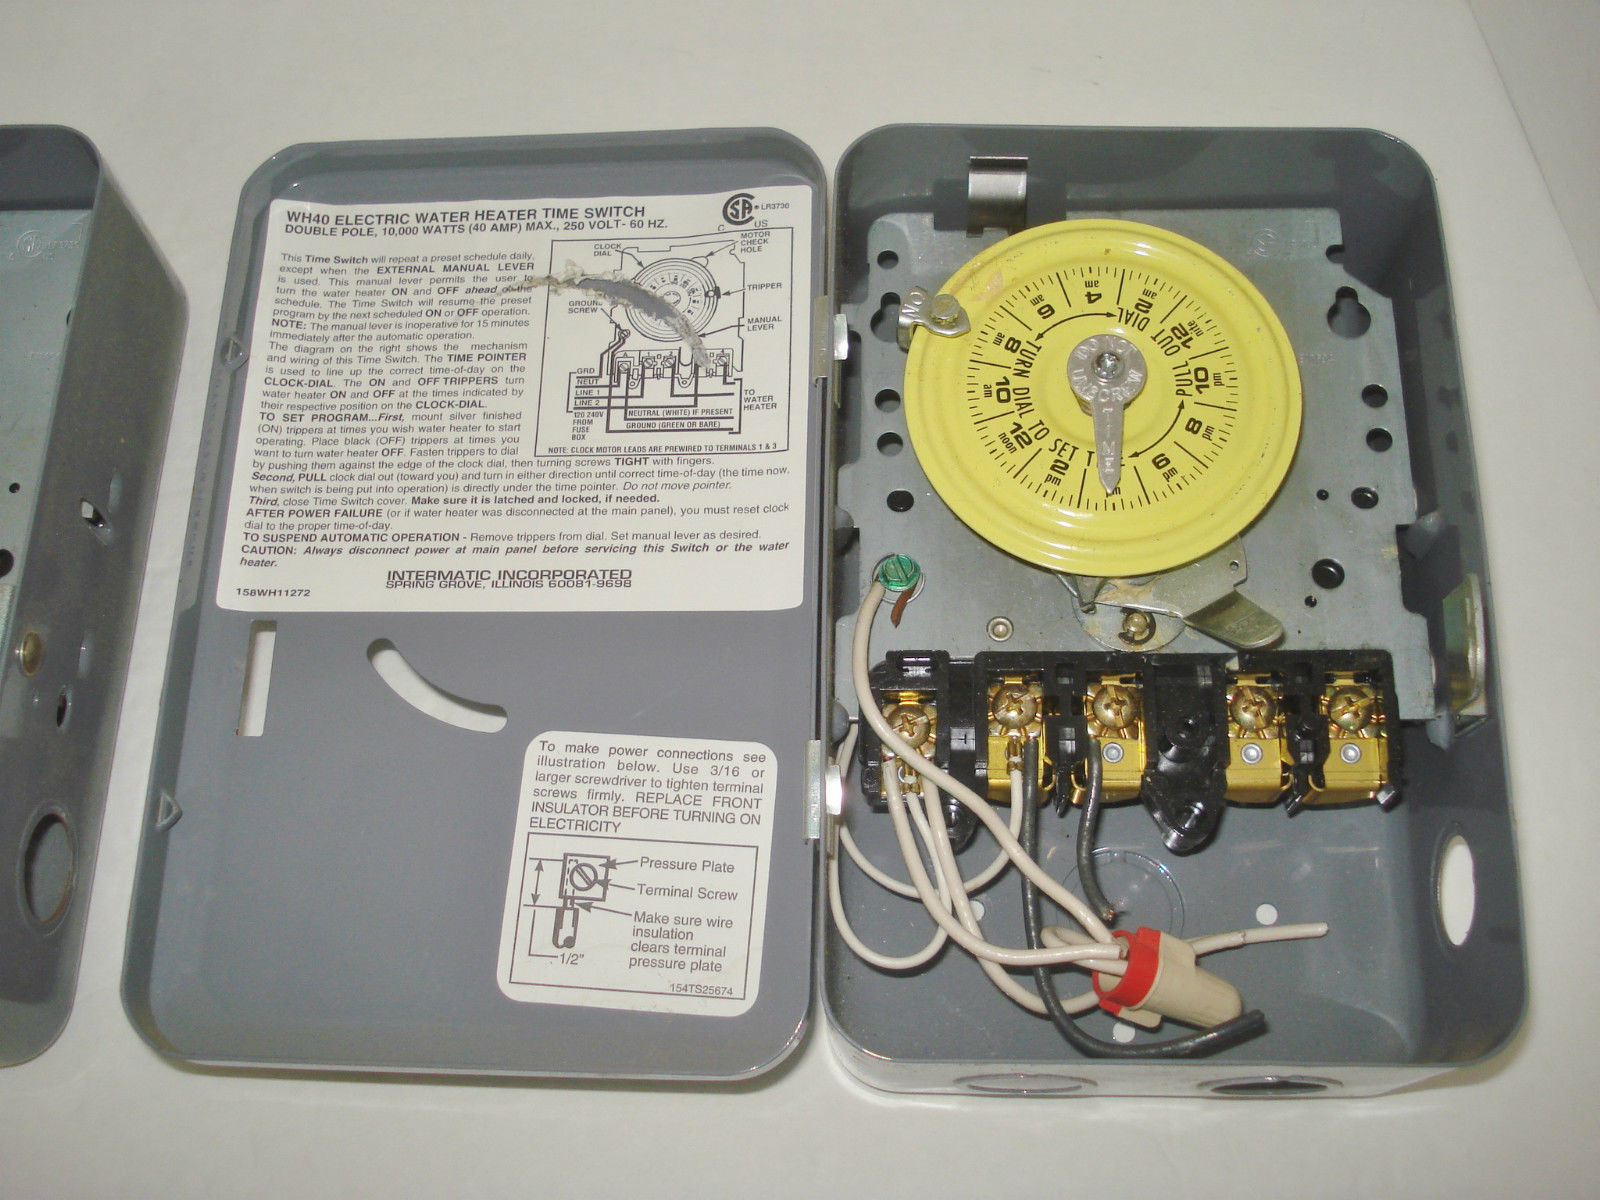 2004 mazda b2300 fuse box diagram lil gray box diagram set of 2 intermatic wh40 electric water heater timer ...